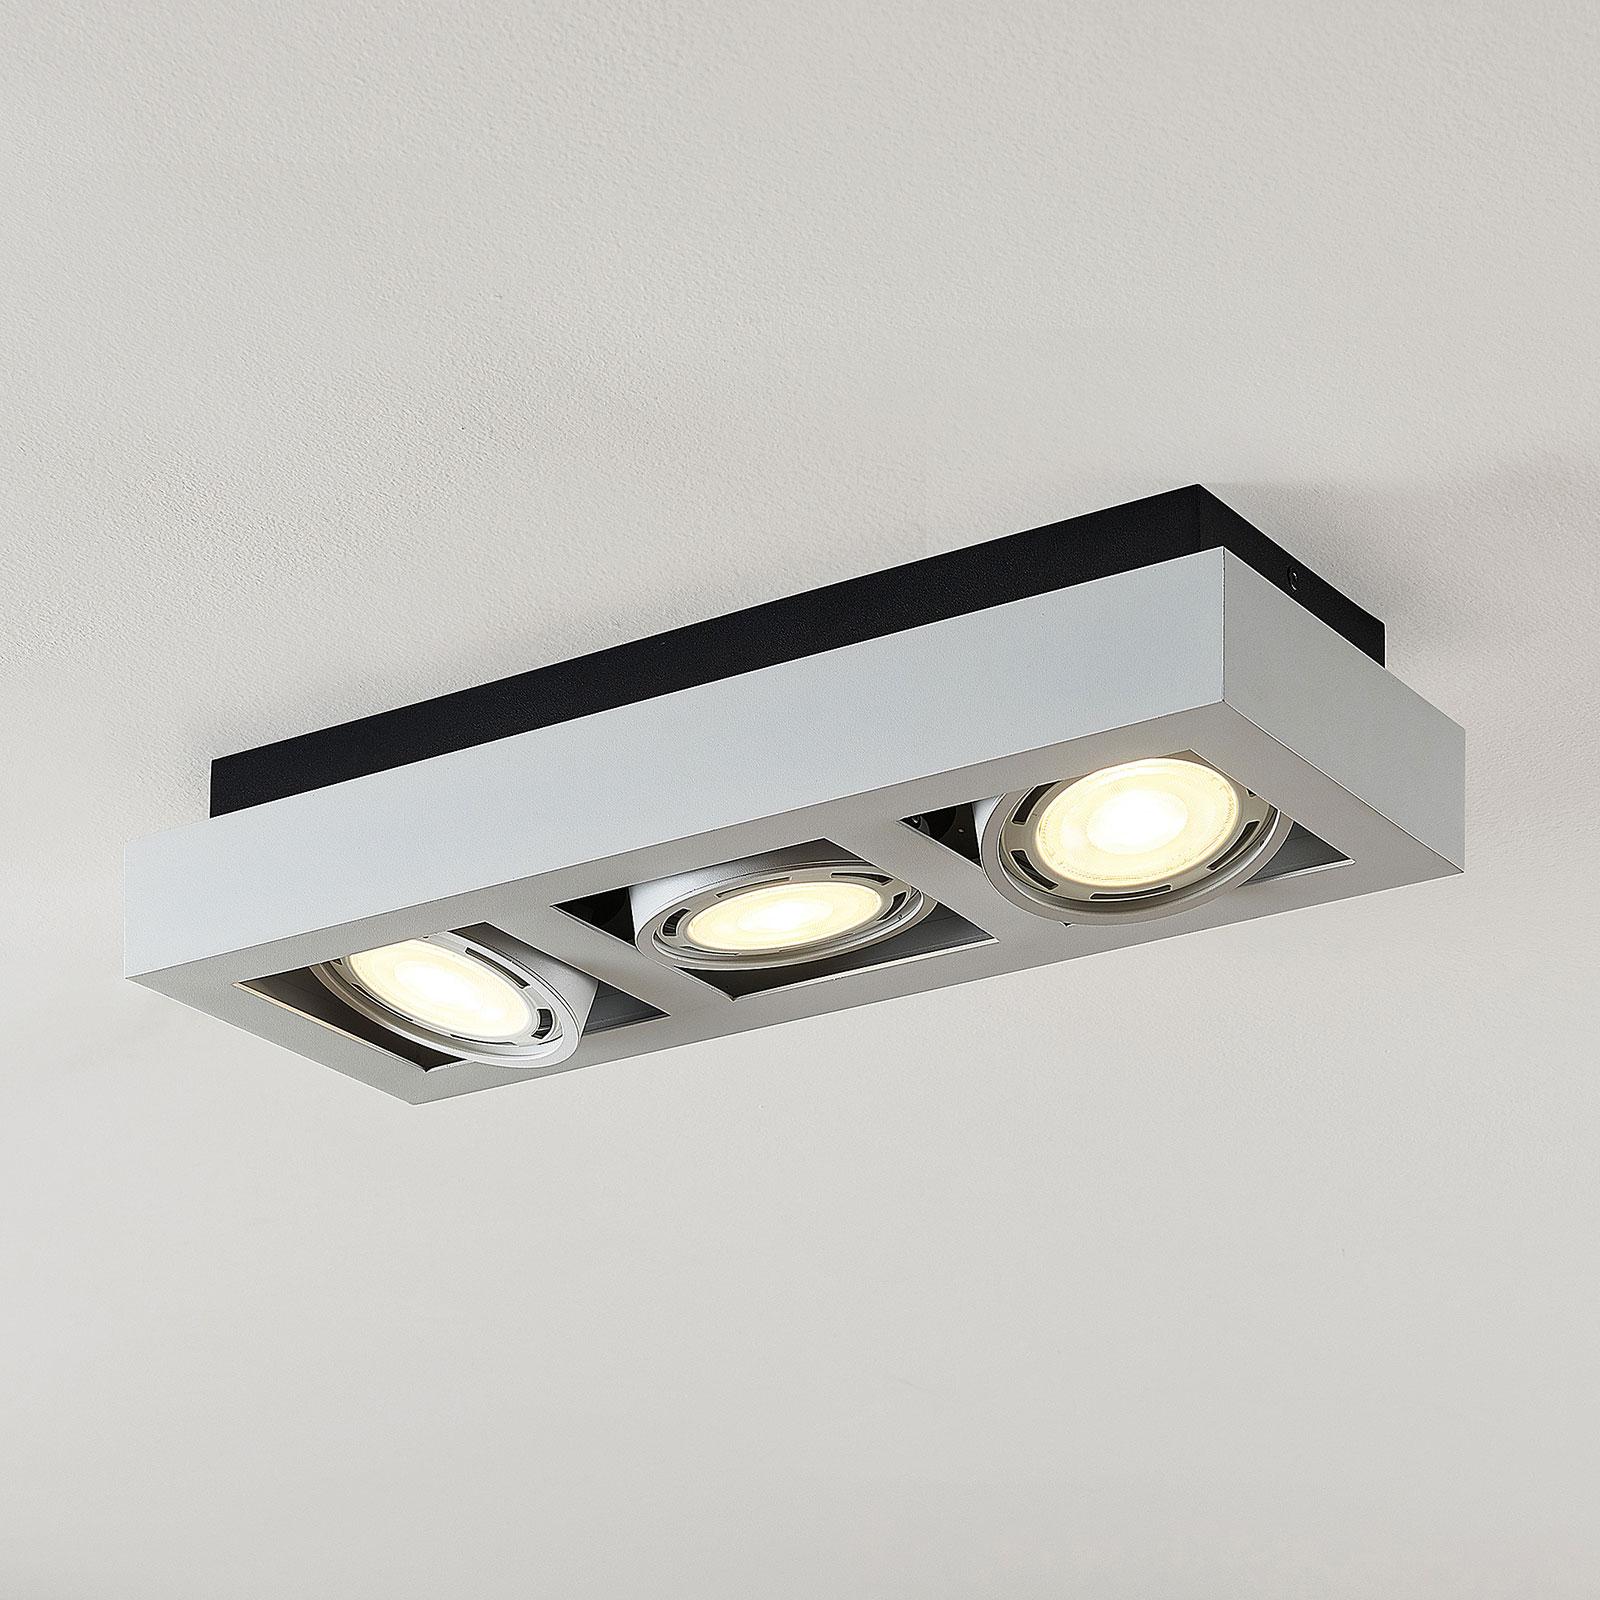 LED-takspot Ronka, GU10, 3 lyskilder, hvit